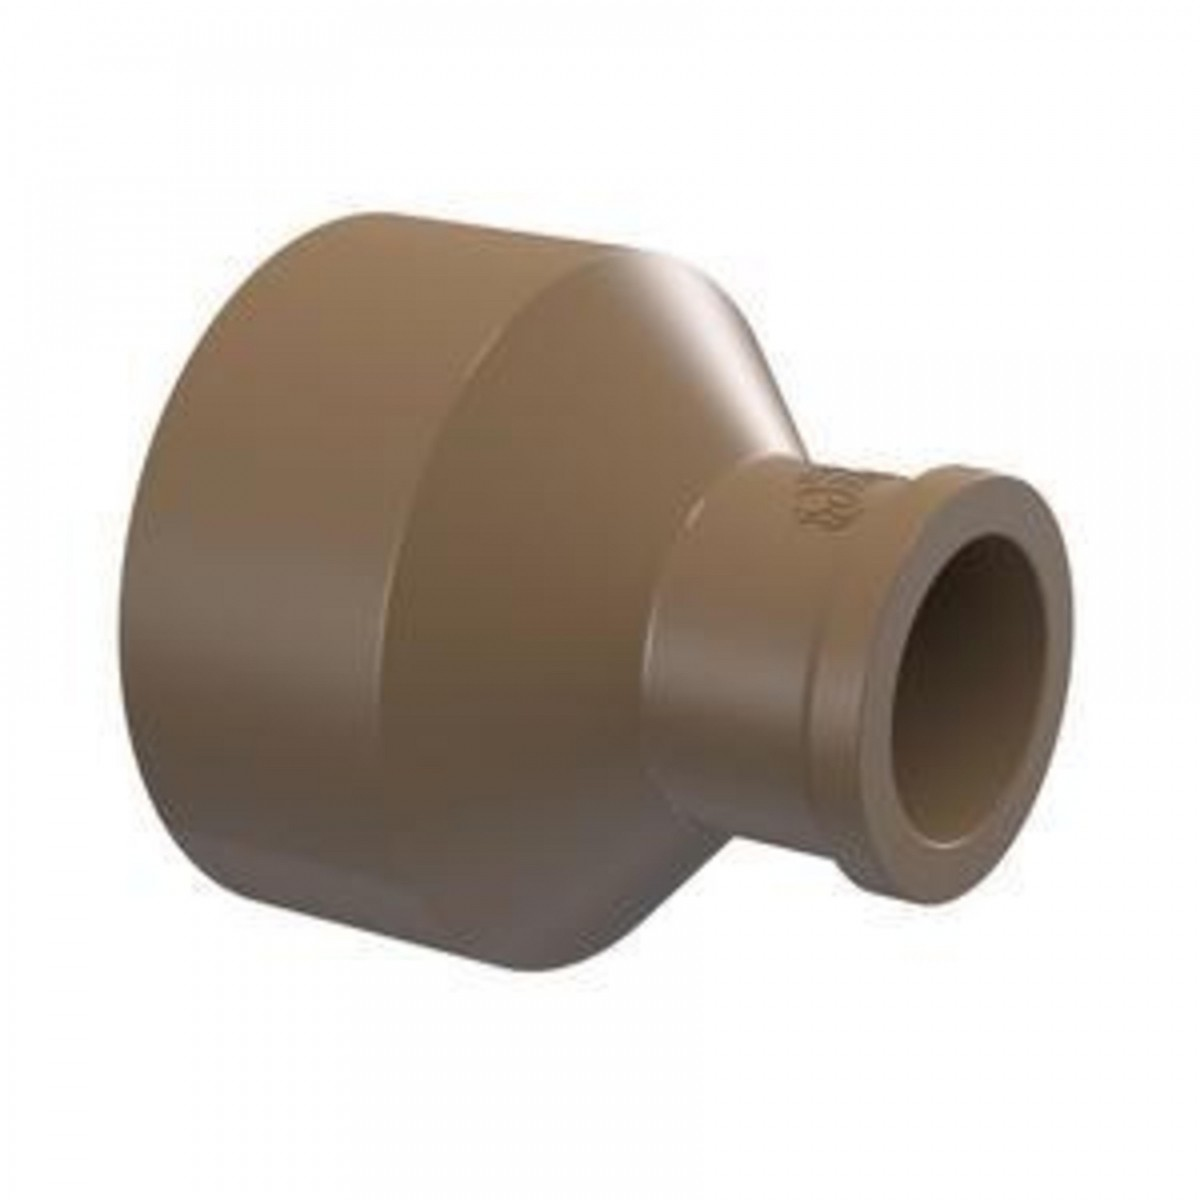 Solda Bucha de Redução Longa 110x60mm (4x2